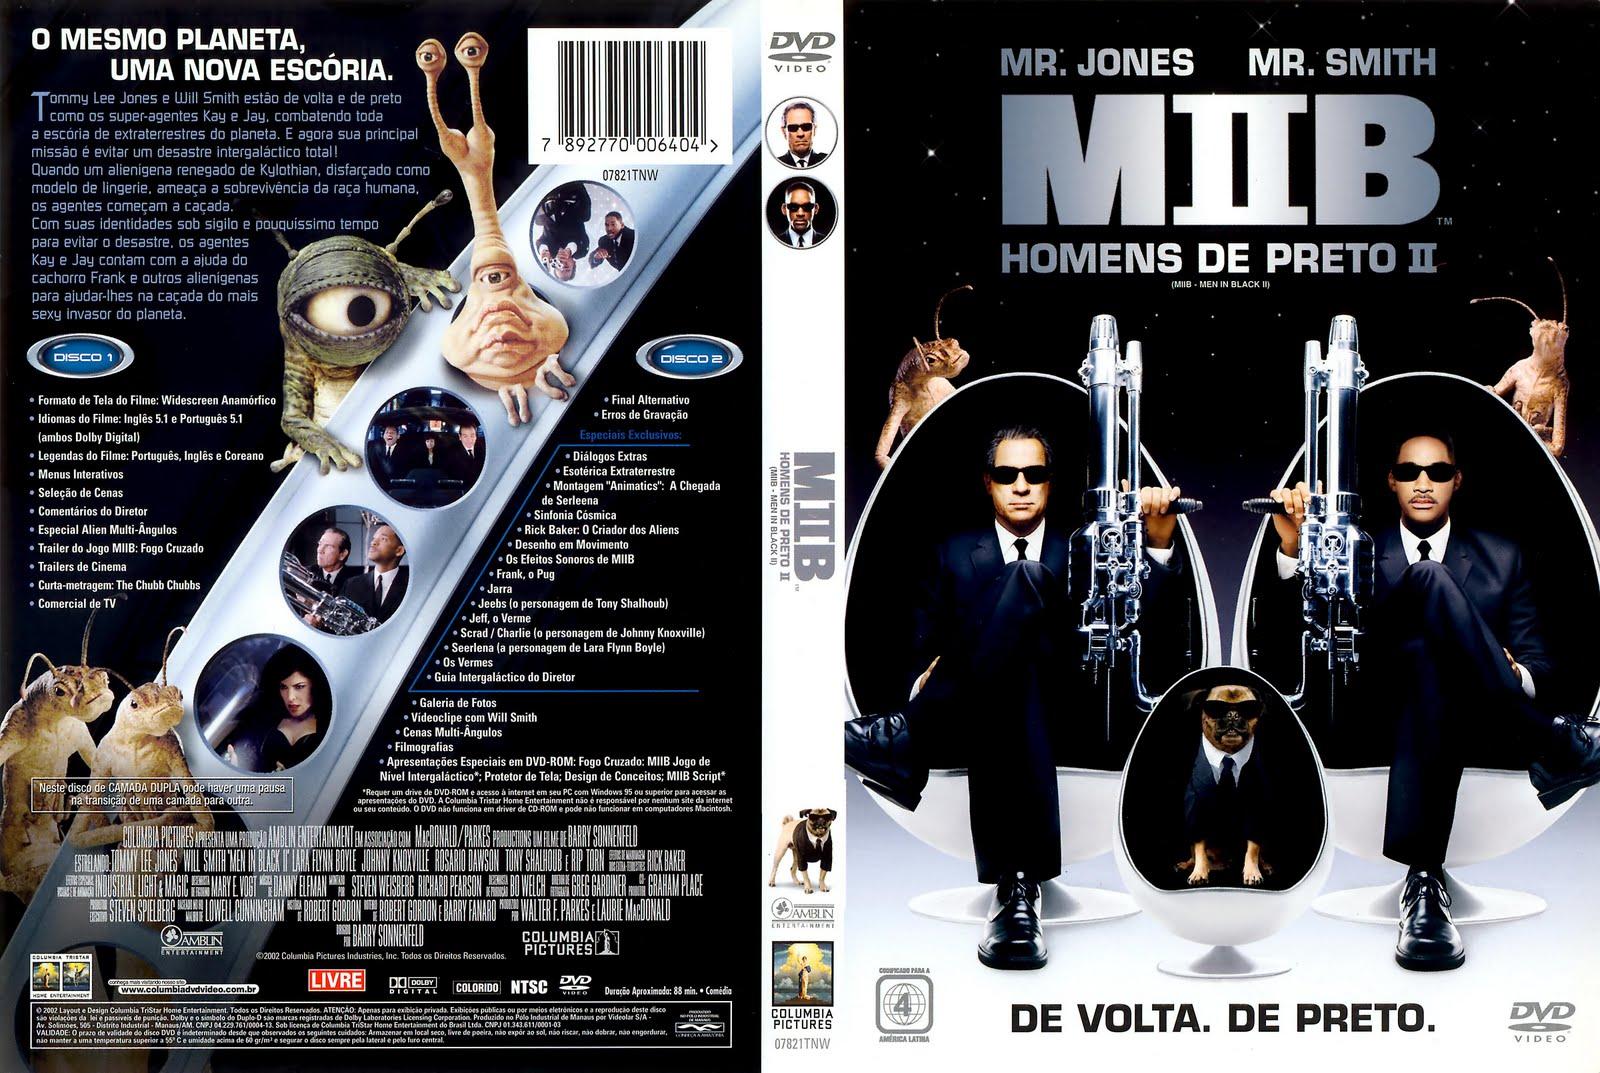 De leo mib homens de preto 1 amp 2 dvdrip avi dual 193 udio 1997 2002